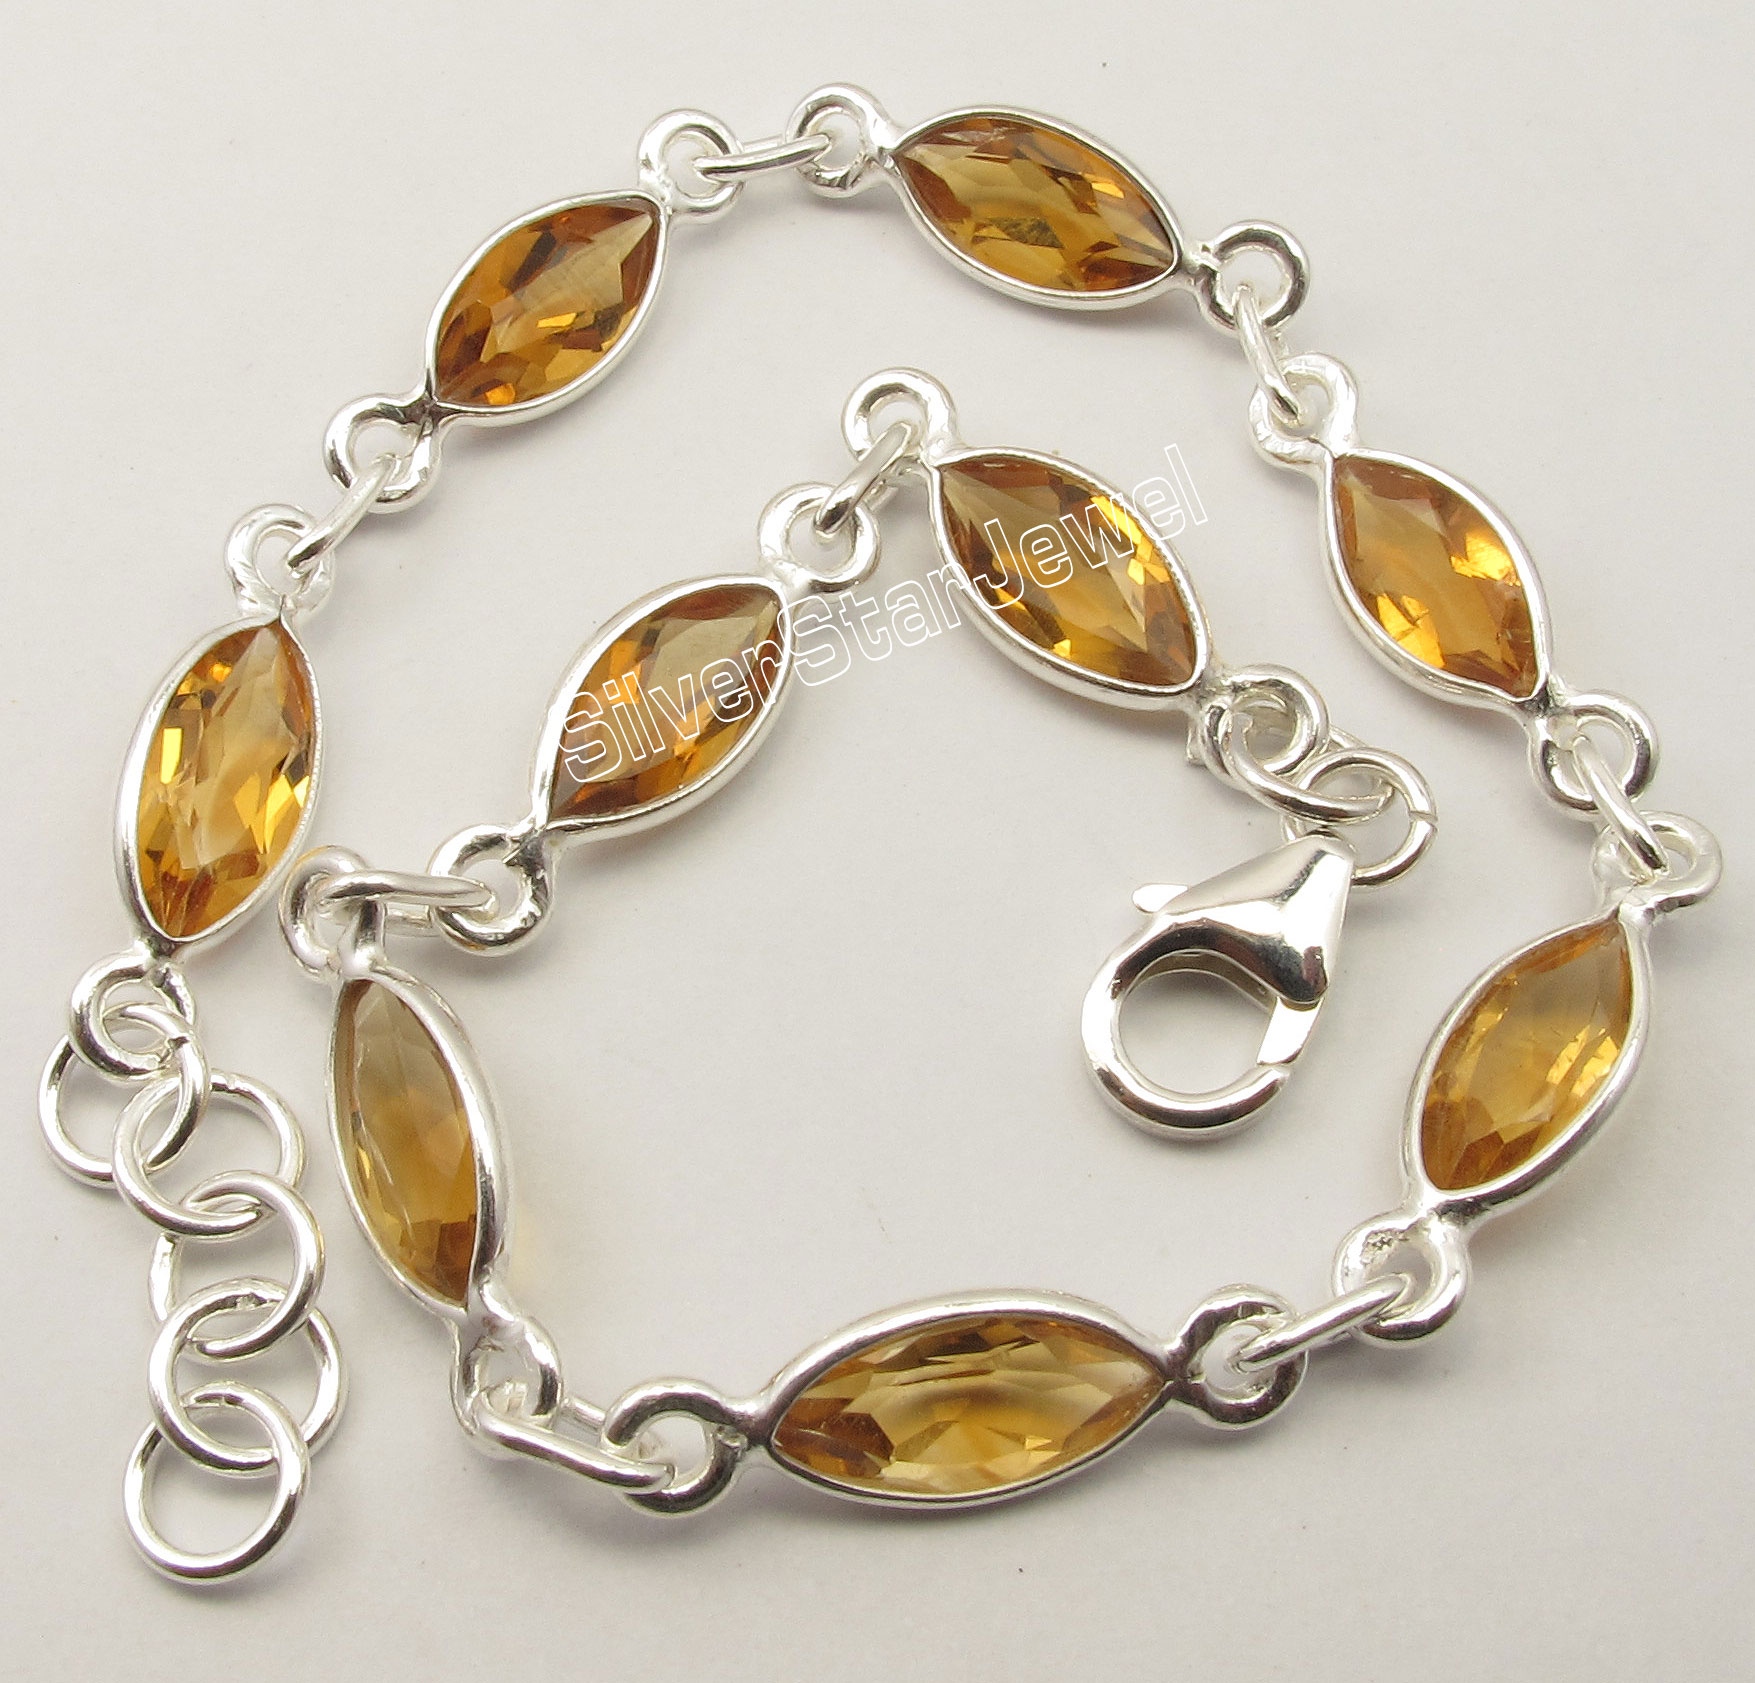 Chanti International Solid Silver YELLOW Citrines 9 Gem LATEST STYLE Bracelet 20.1 CM BIJOUX